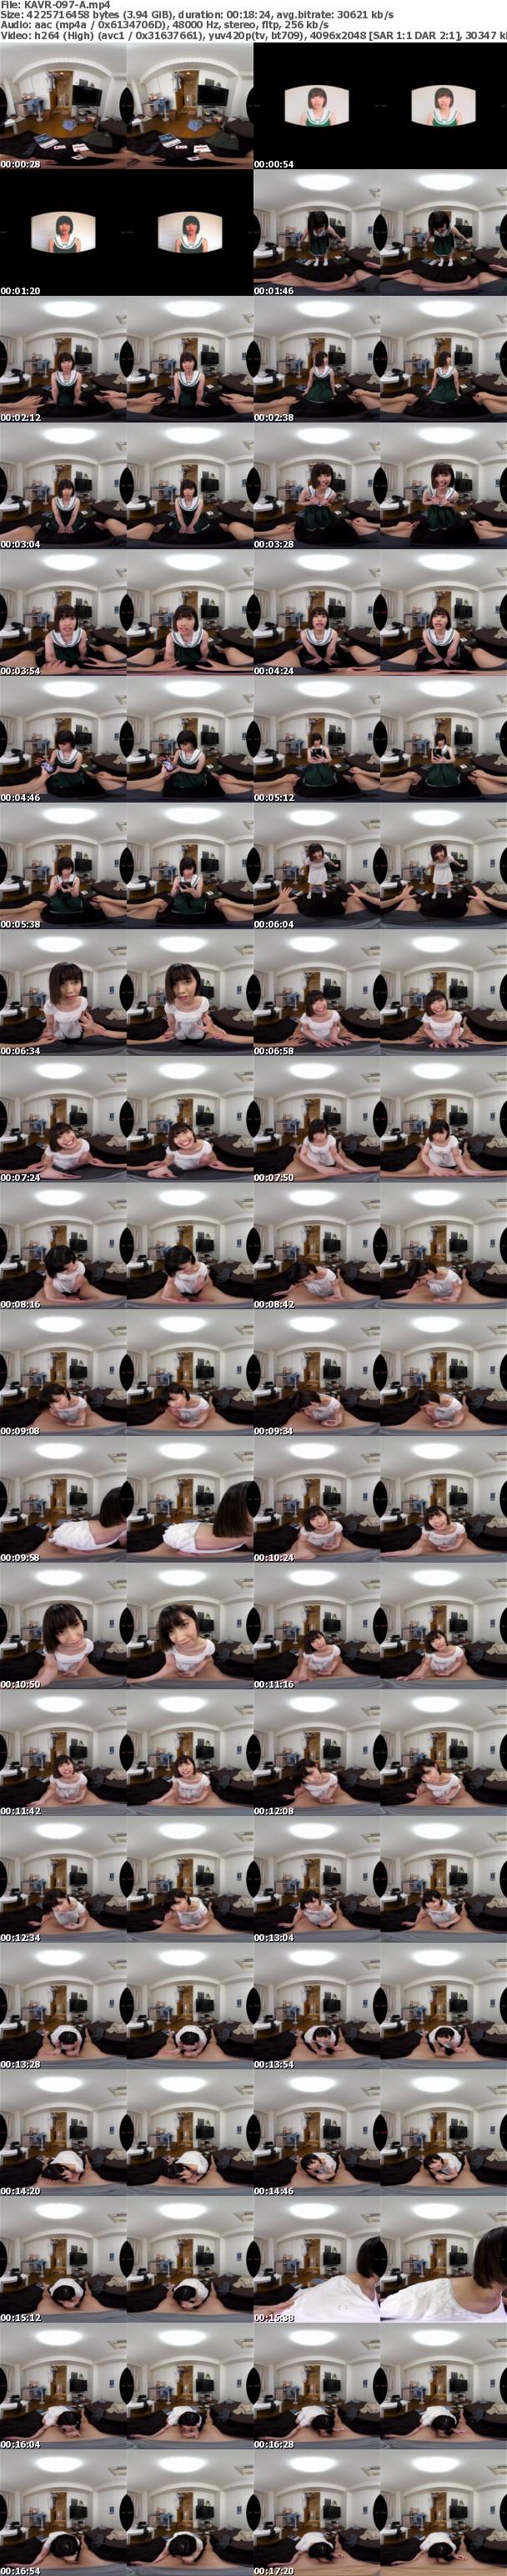 (VR) KAVR-097 電網少女-INTERNET GIRL NOZOMI-解き放たれた20年分のエロス 石原希望